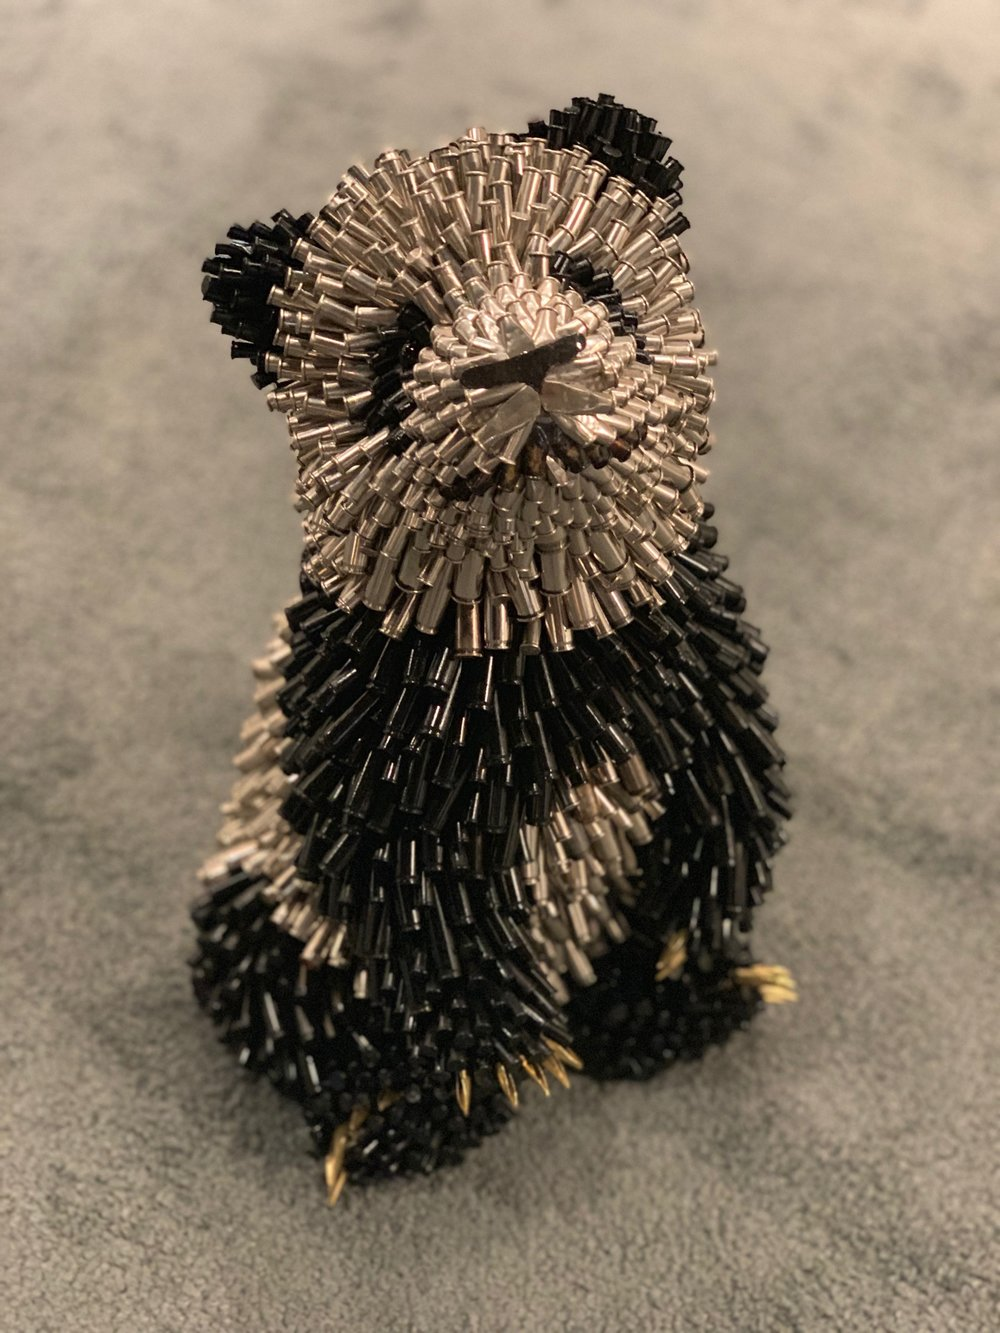 Federico Uribe (Colombian, b. 1962)   Baby Panda (Patient) , 2019  Bullet Shells 15 x 11 x 9 in. (38.1 x 27.9 x 22.9 cm)  ACPB0361